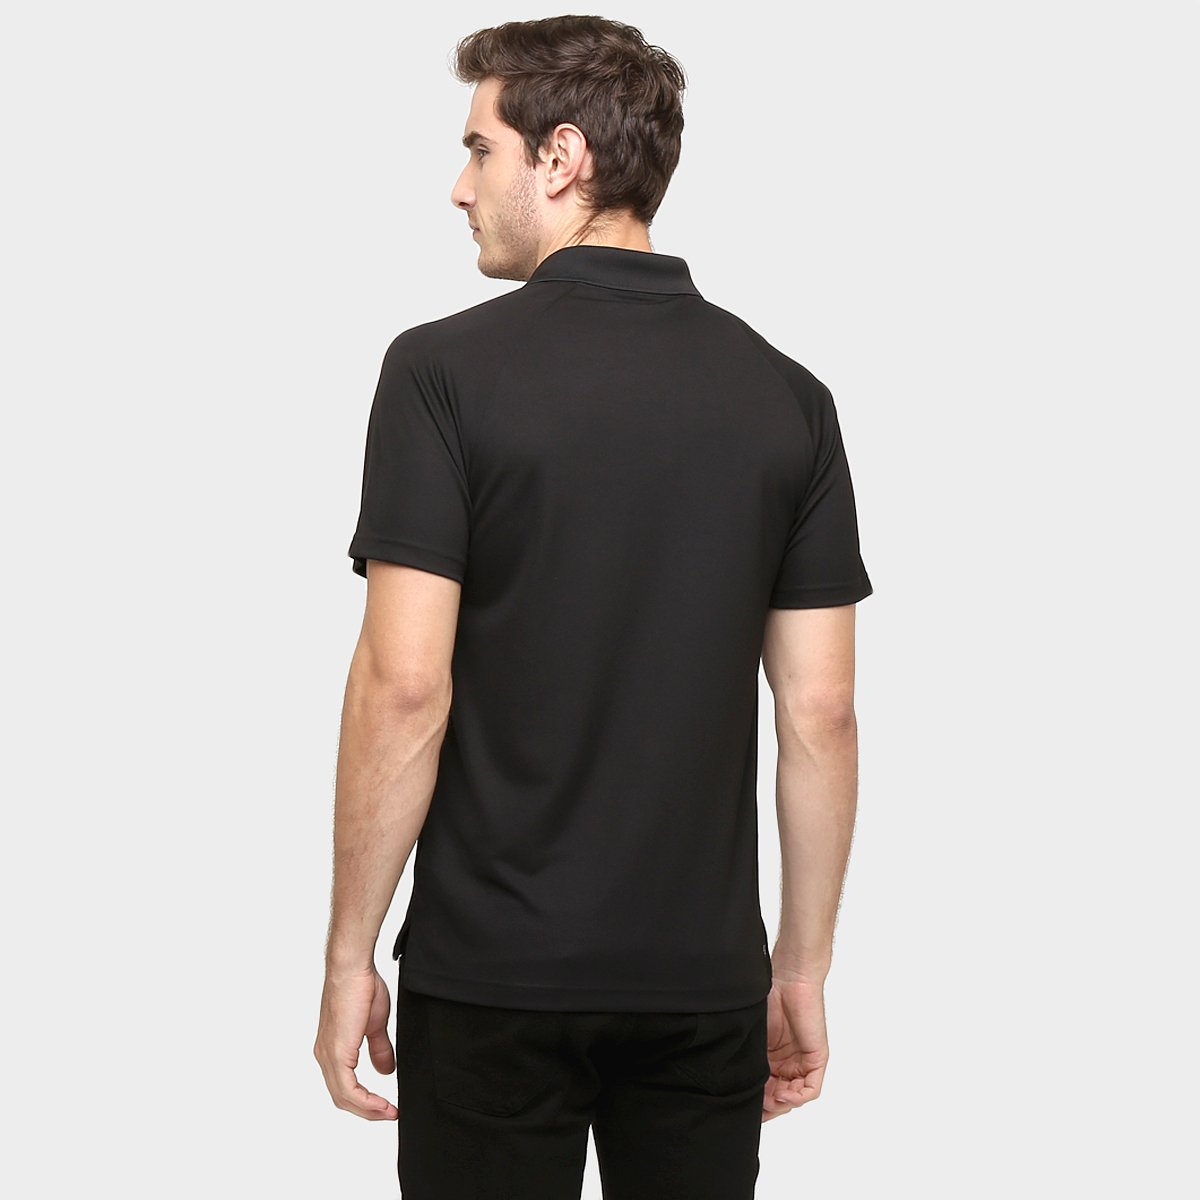 7a45b1820d6 Camisa Polo Lacoste Lisa  Camisa Polo Lacoste Lisa ...